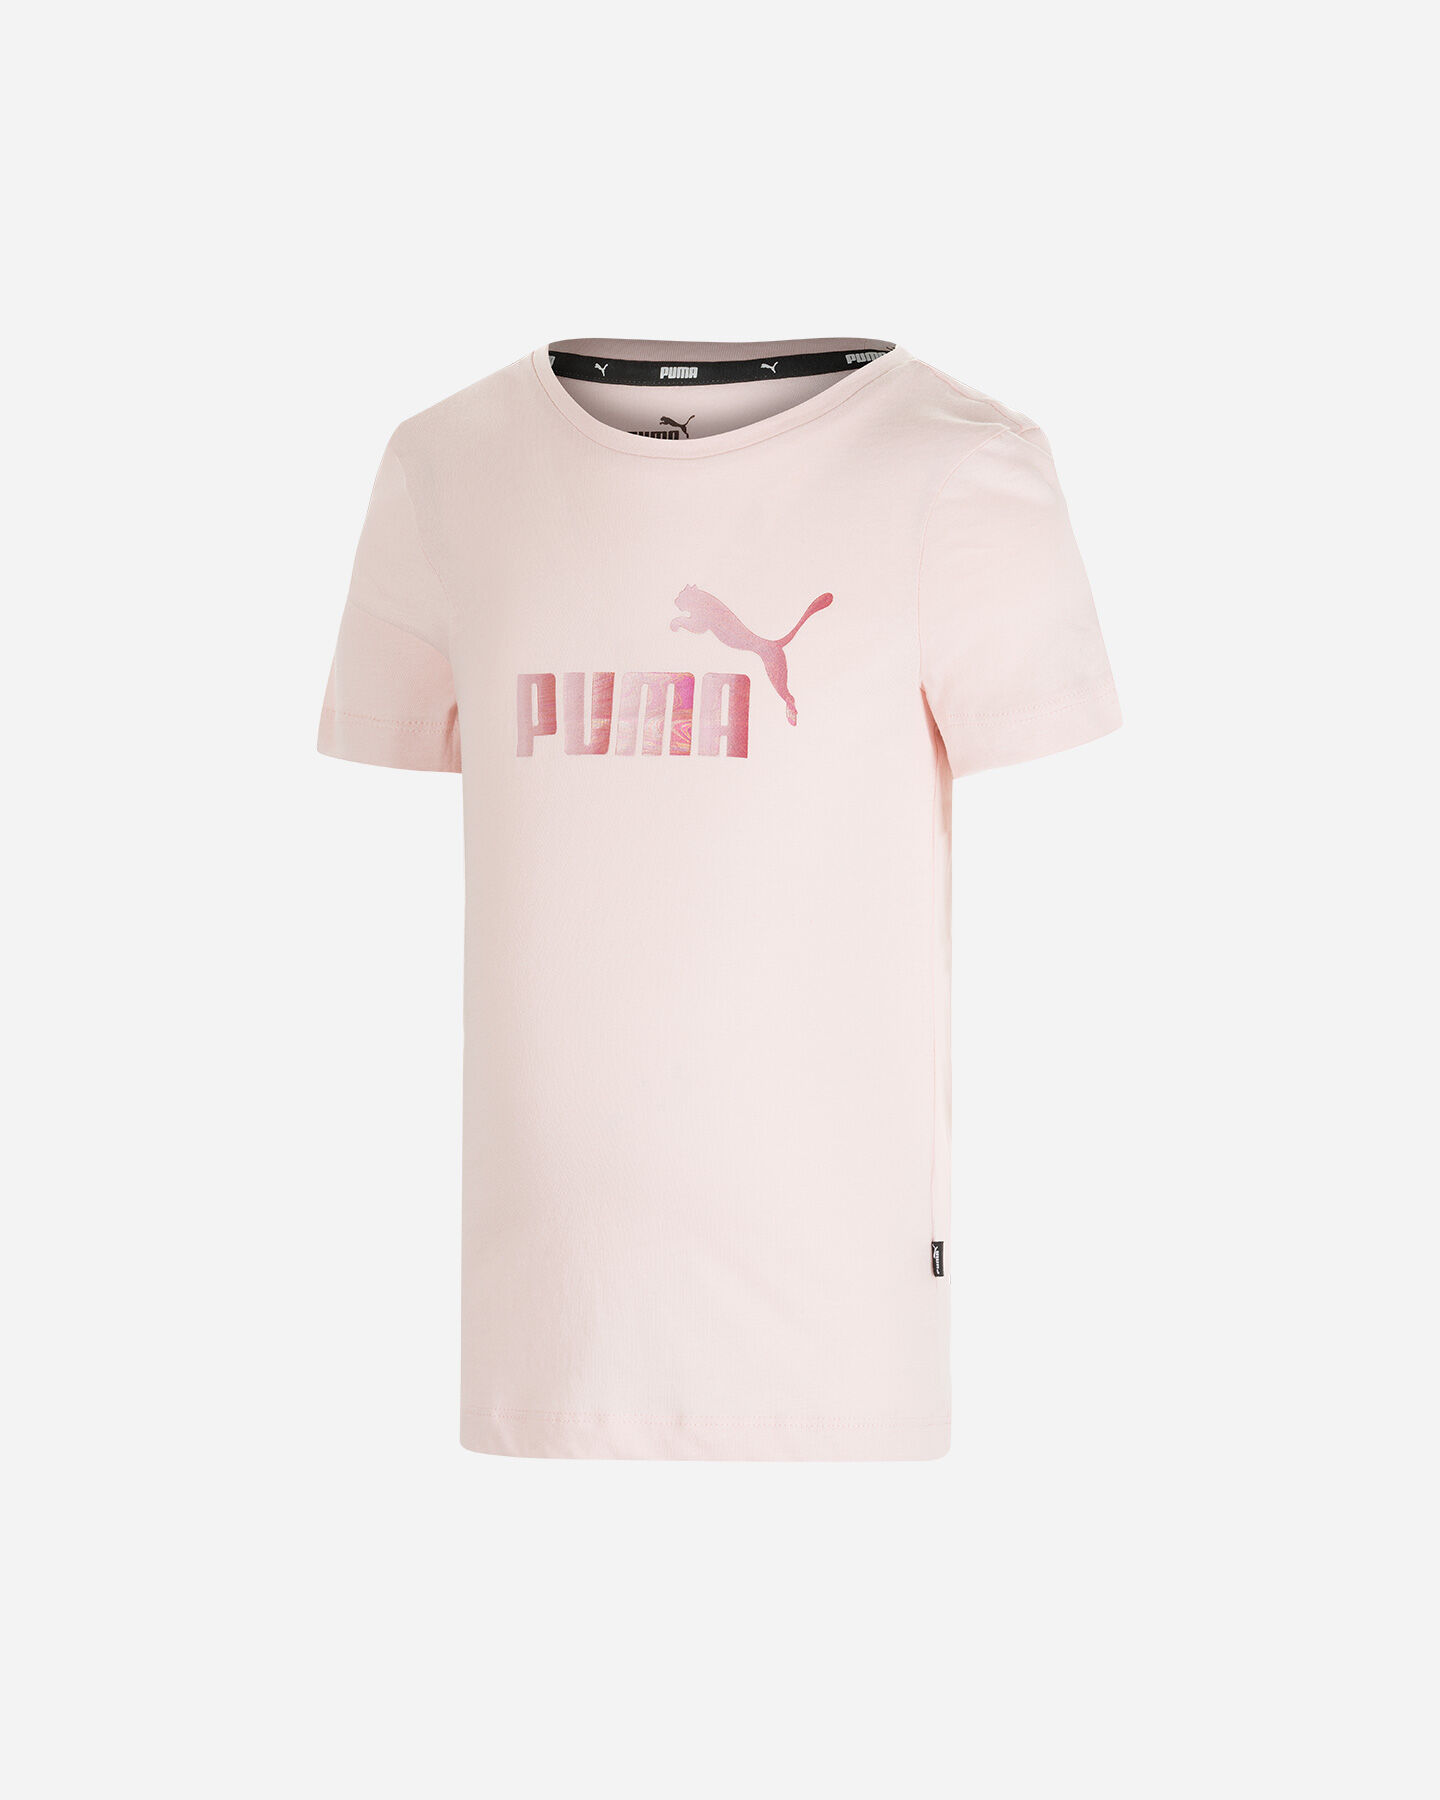 T-Shirt PUMA BASIC JR S5339167 scatto 0